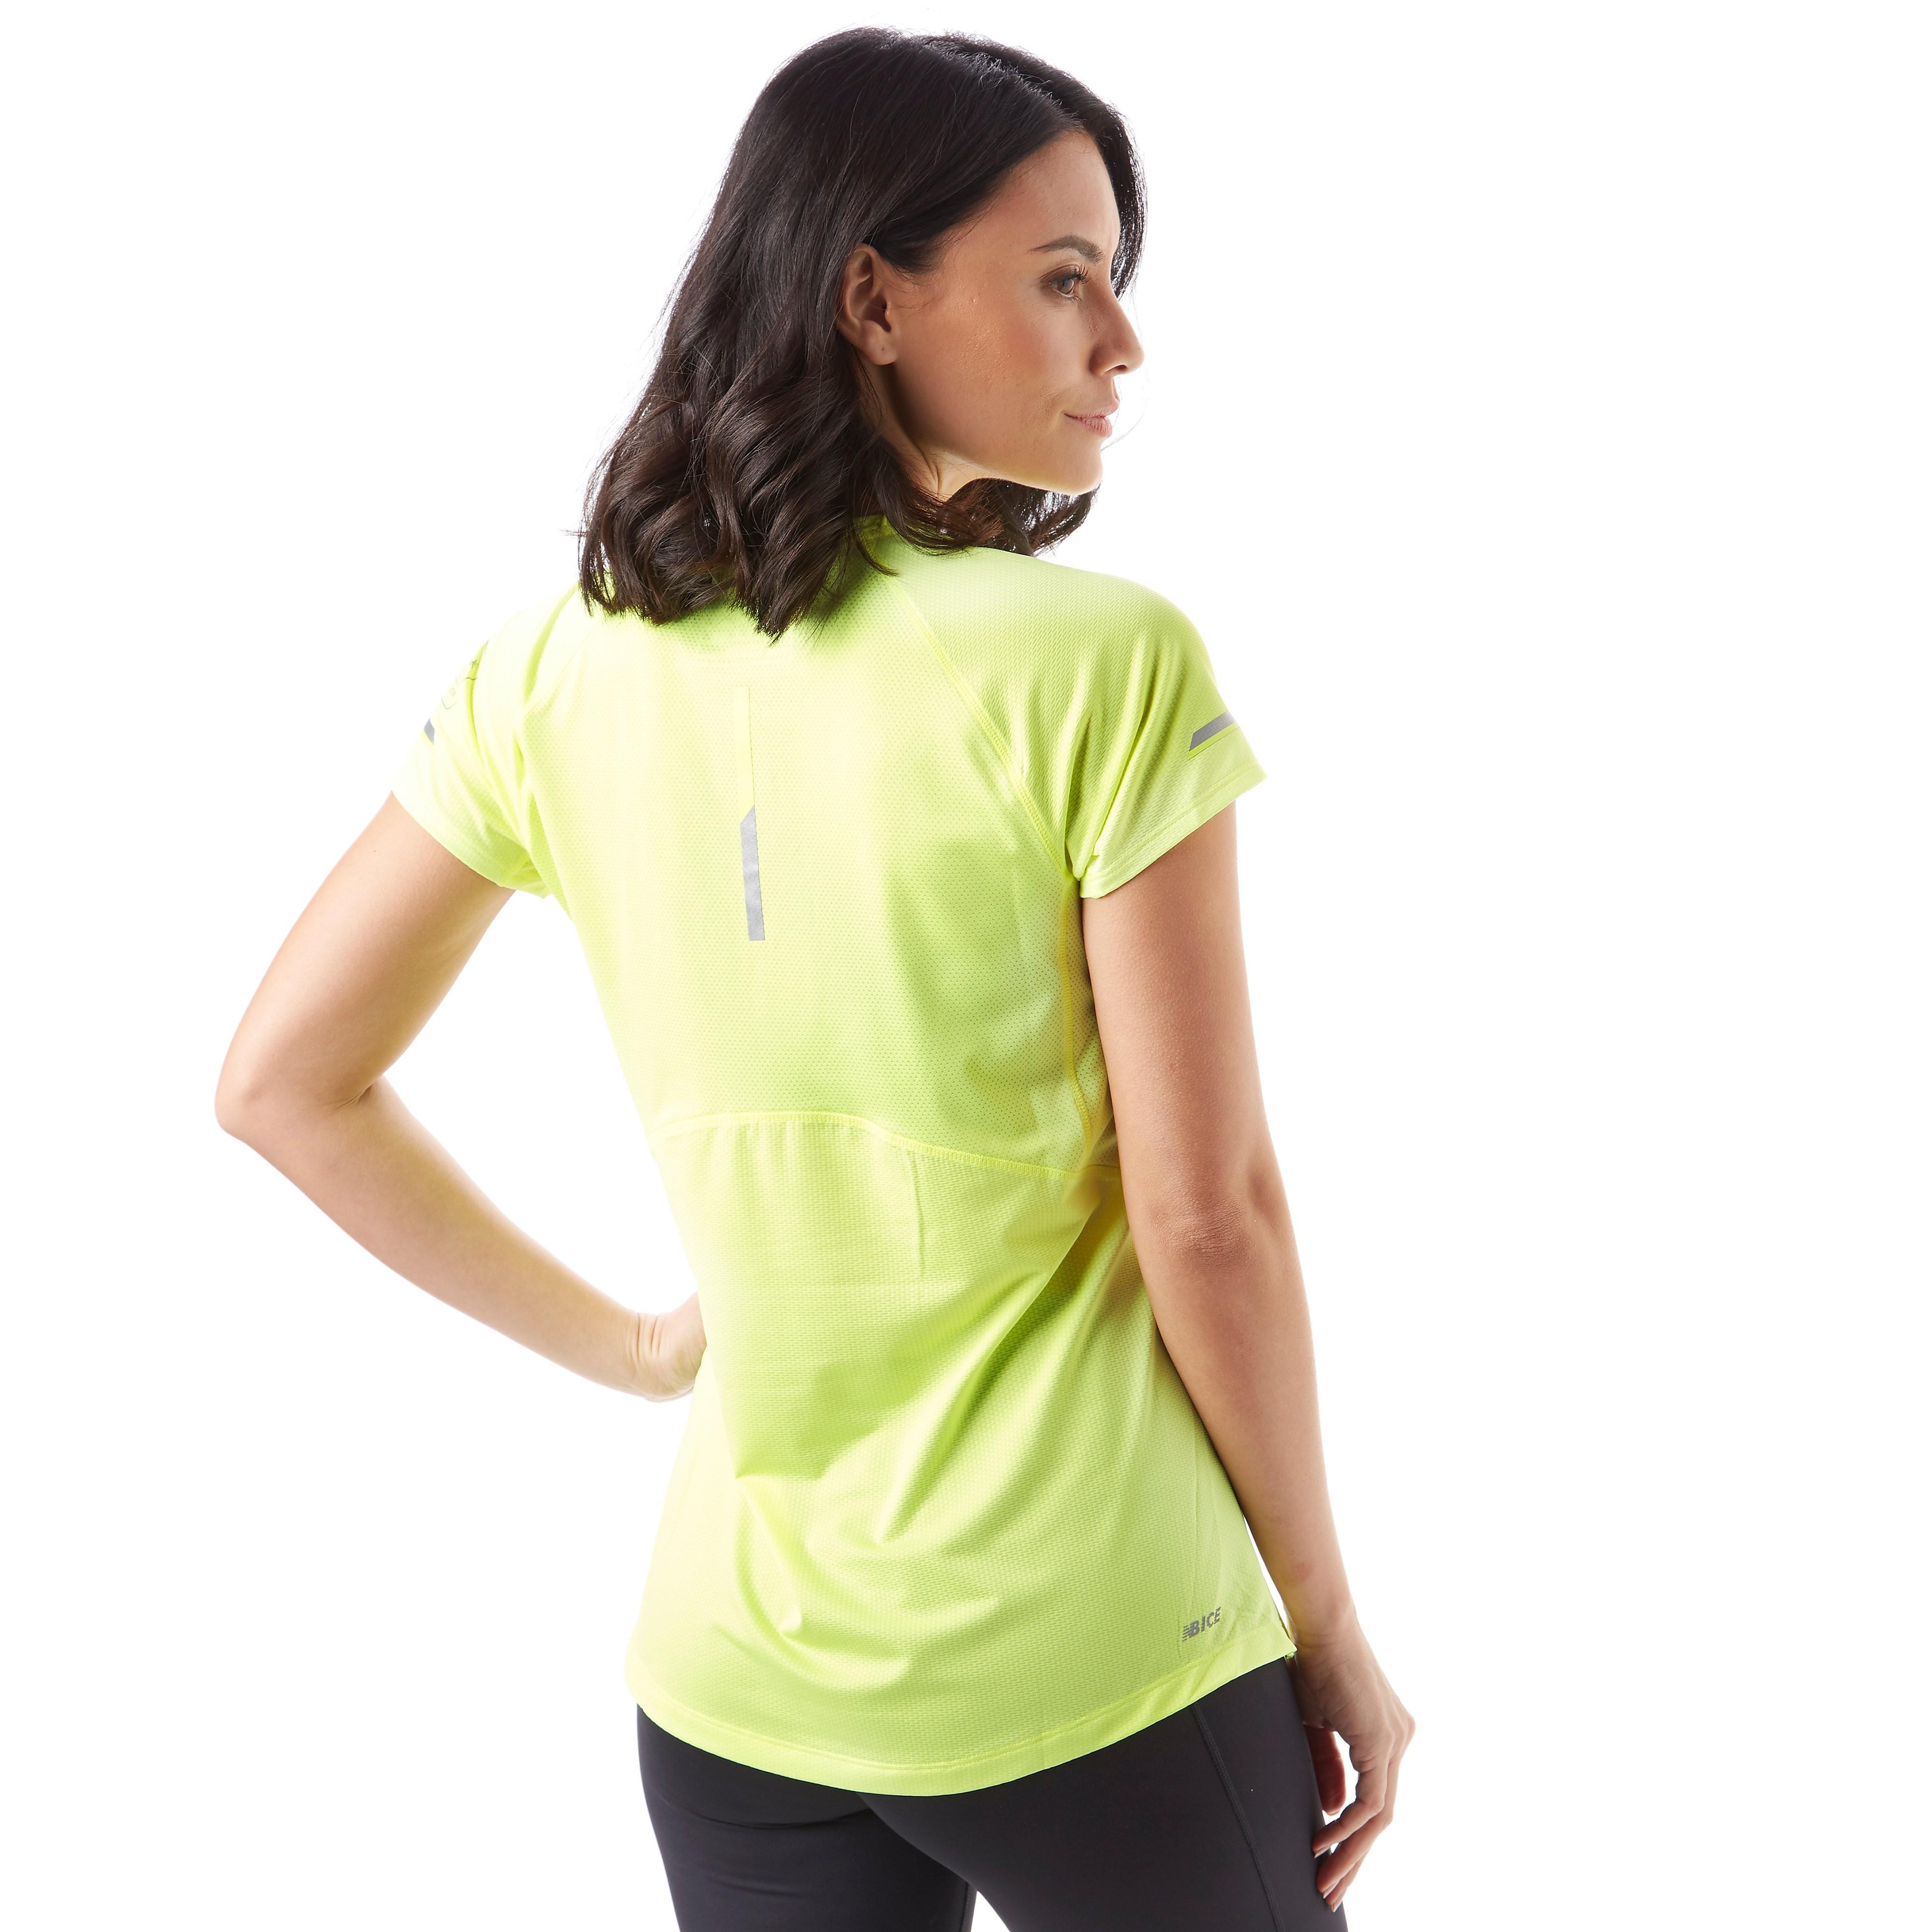 New Balance London Marathon Edition NB Ice 2.0 Short Sleeve Women's Training Top